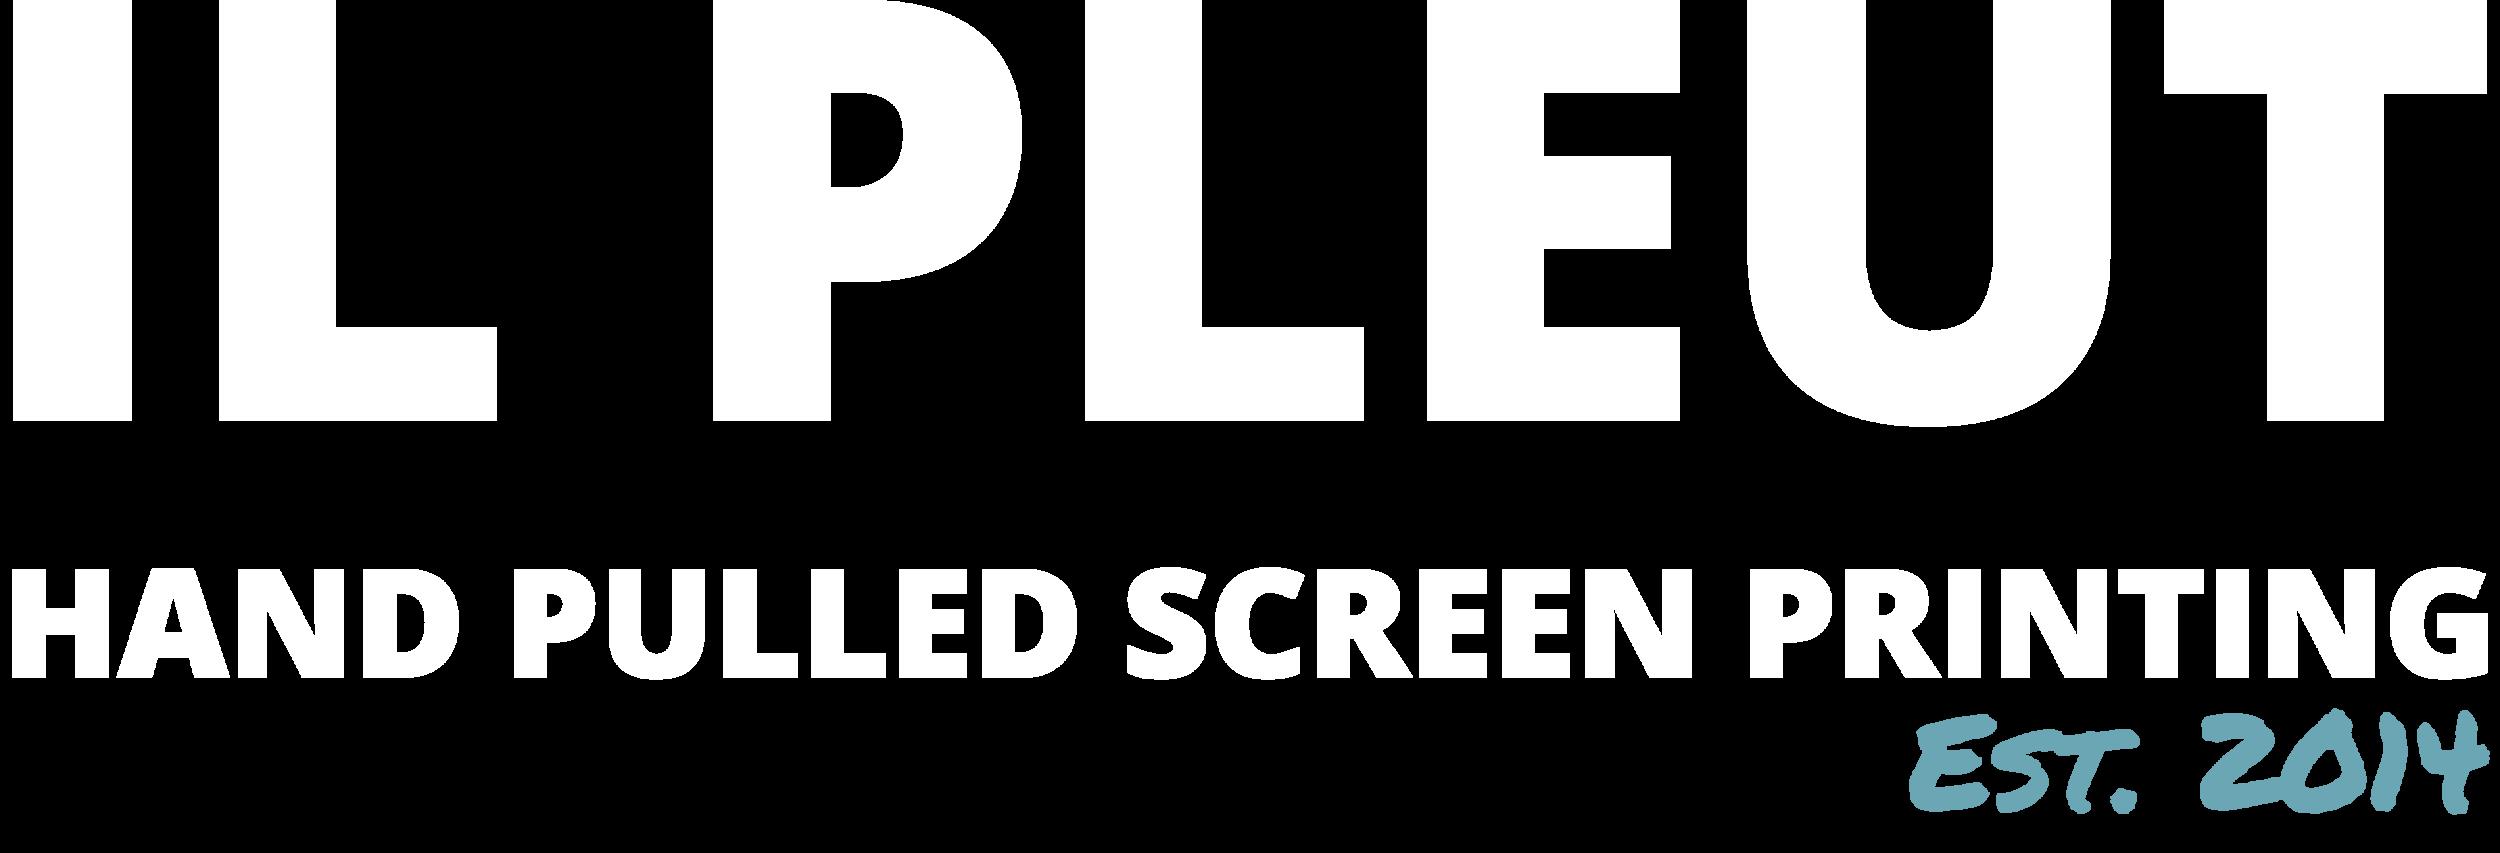 Est Logo.png